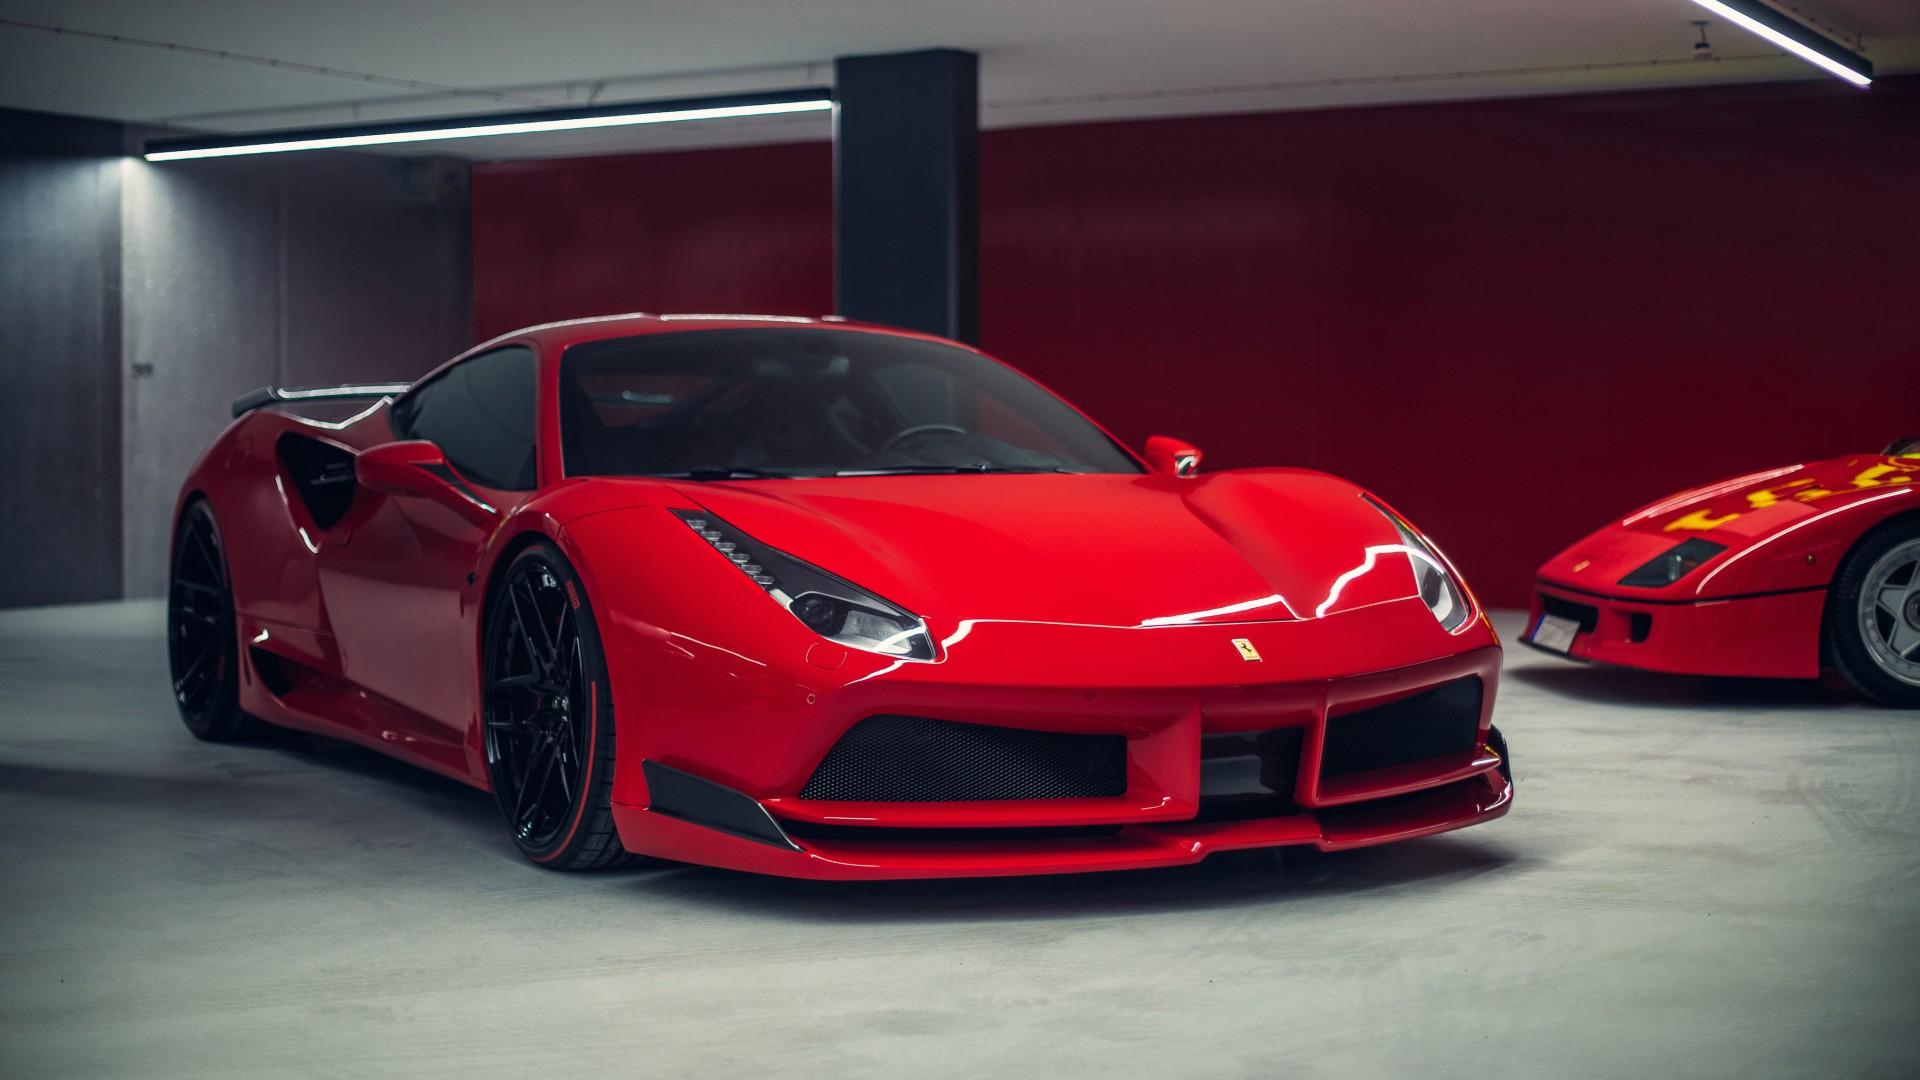 Car Wallpapers Download Full Hd Novitec N Largo Ferrari 488 Gtb 6 Wallpaper Hd Car